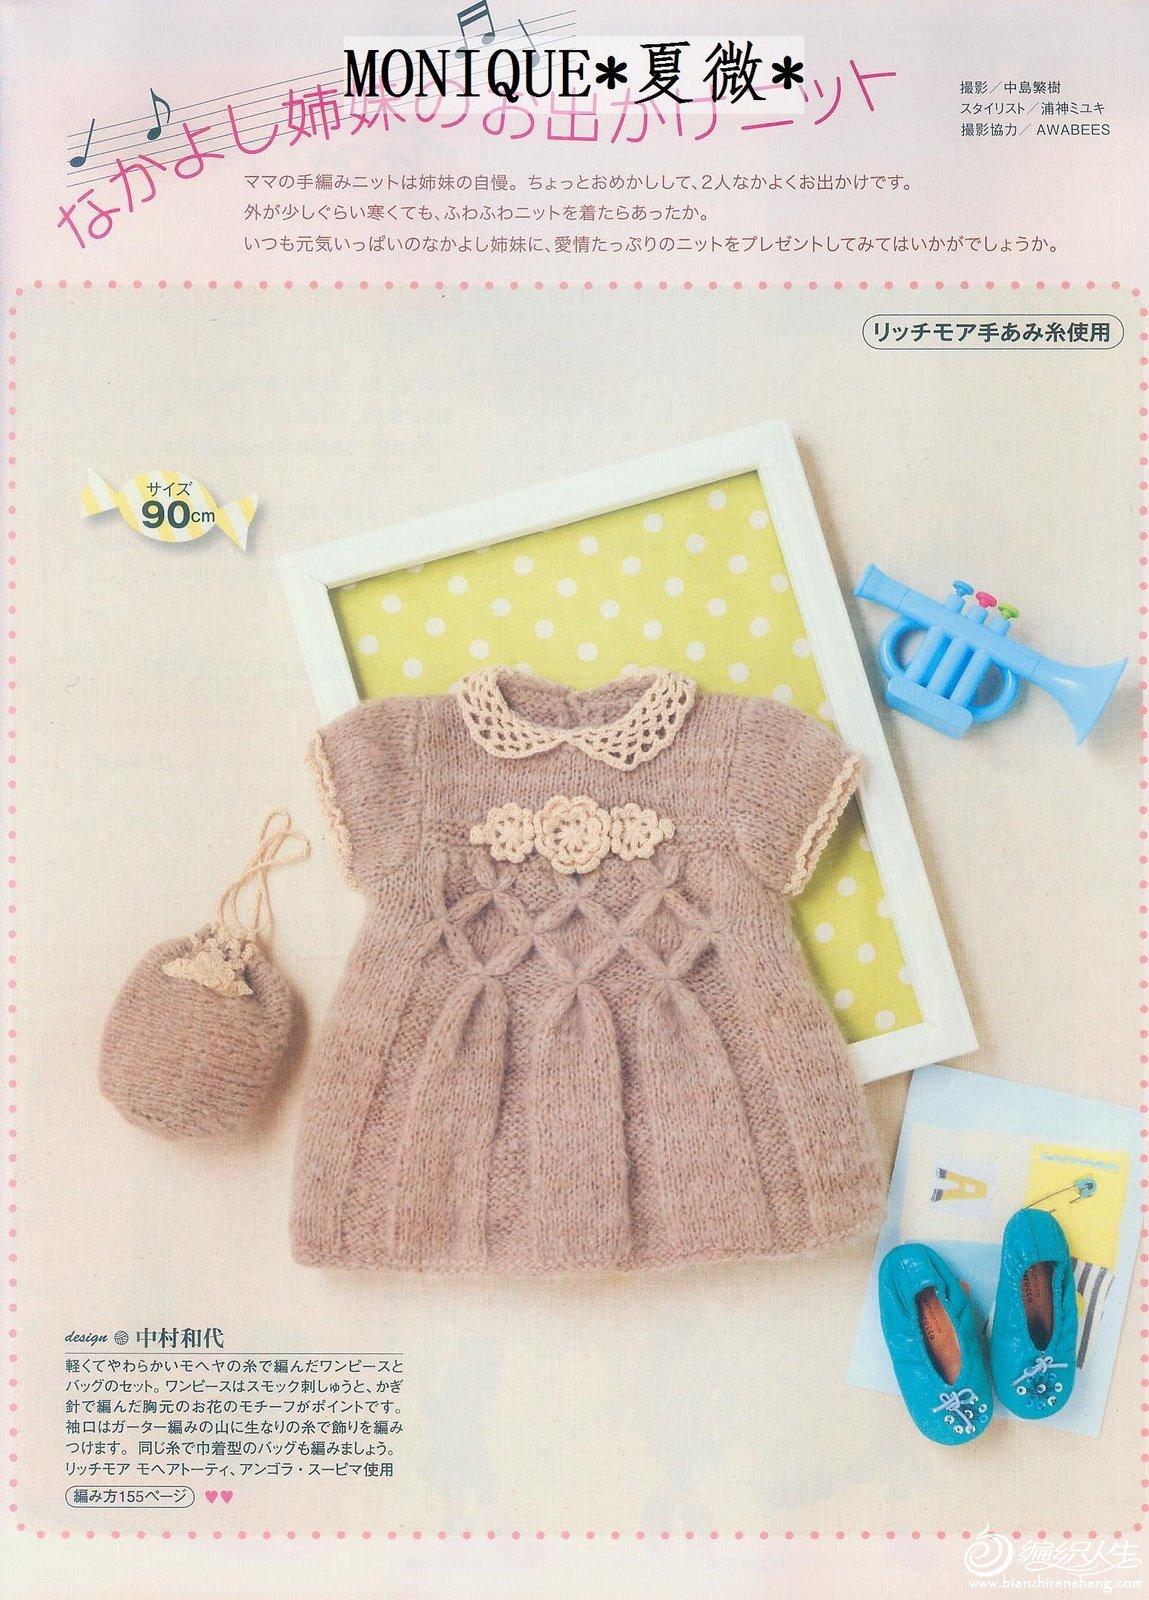 qun-knit-bbkd143.jpg